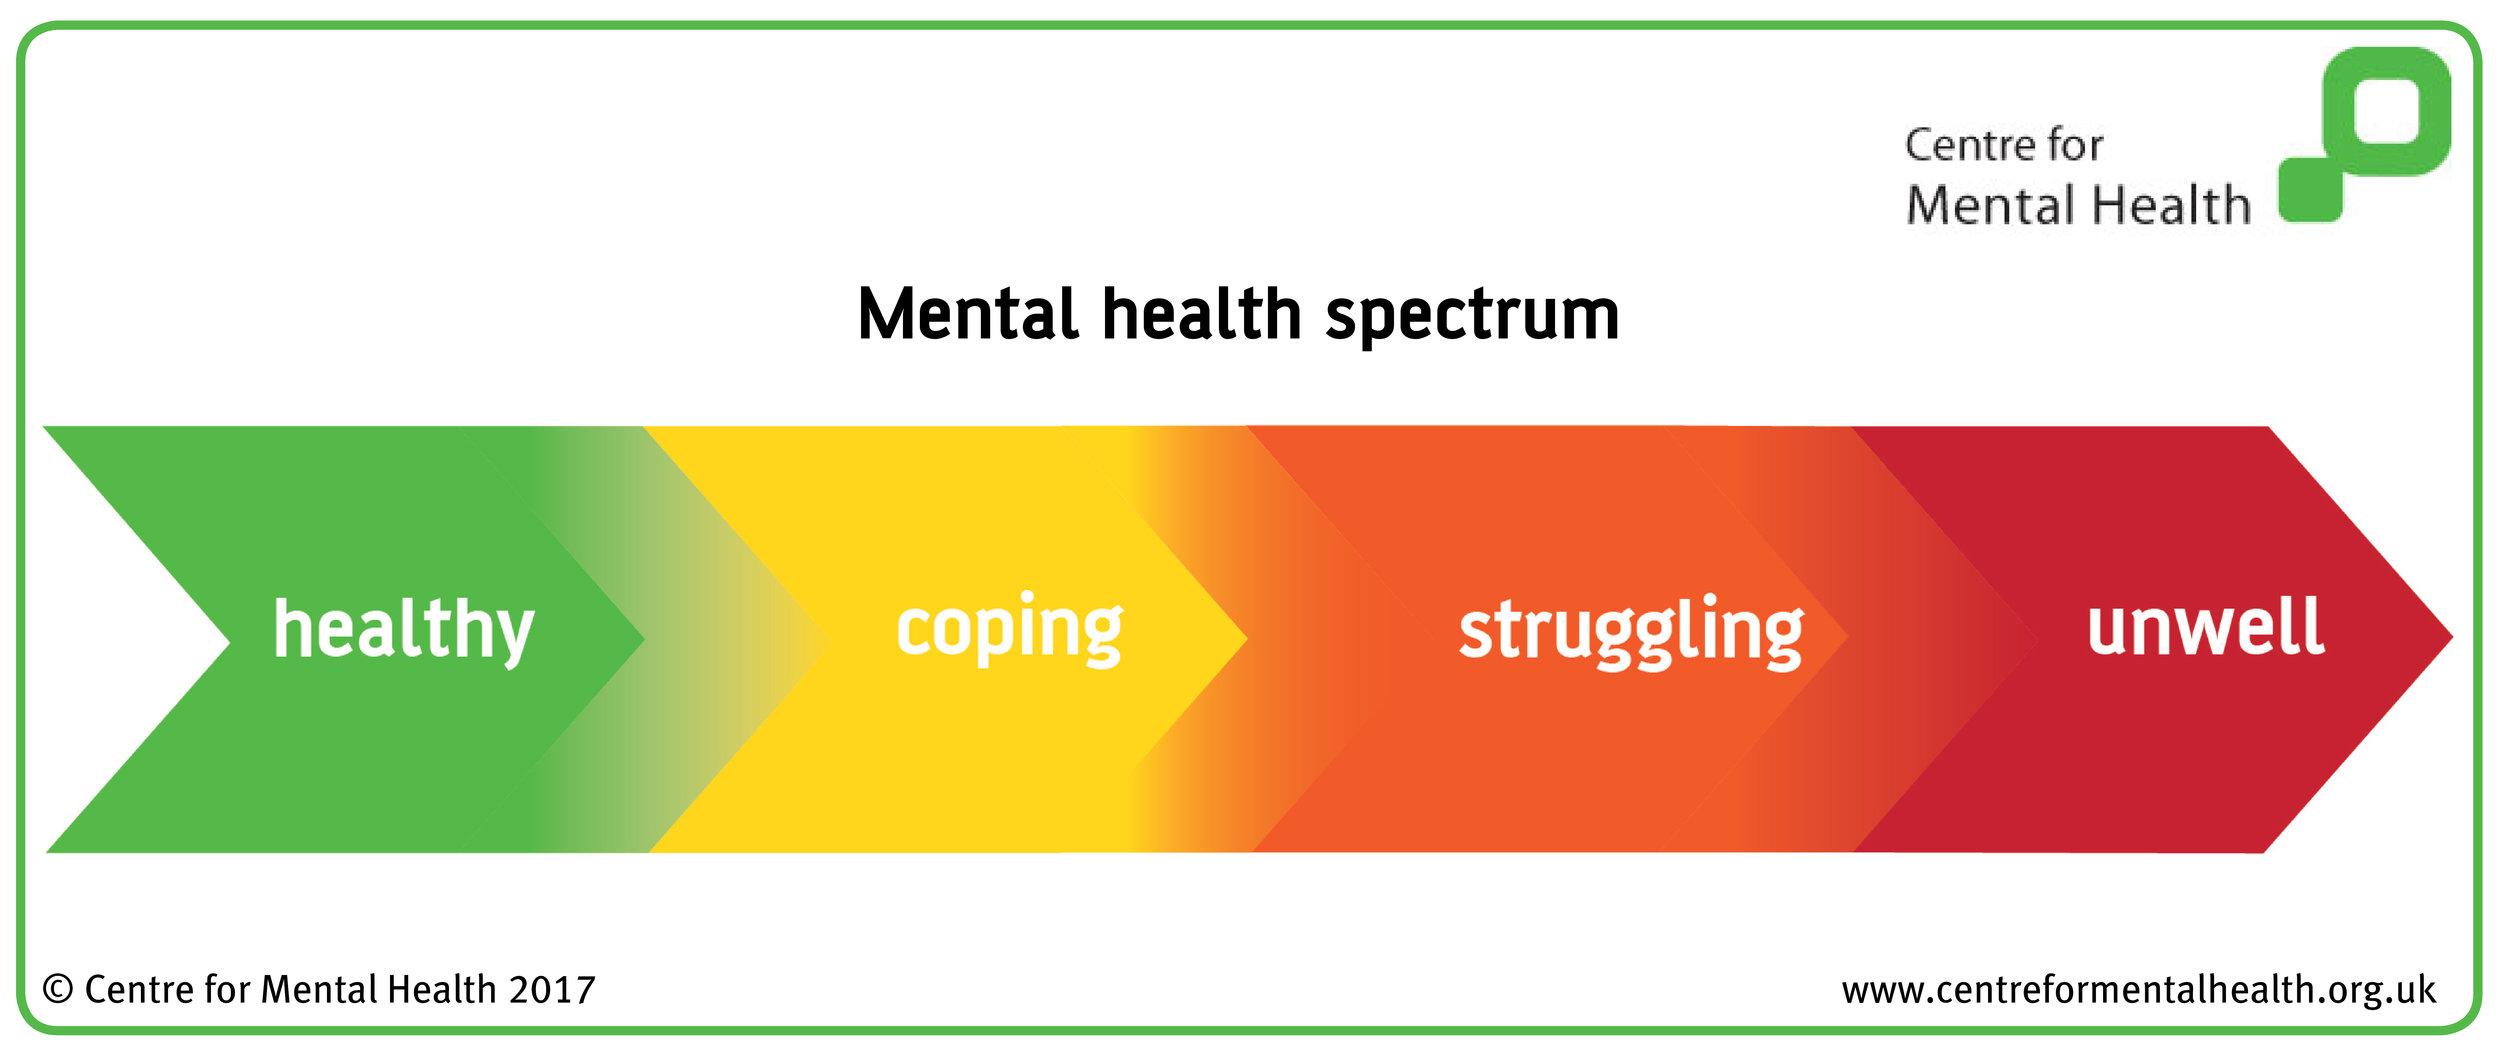 mental_health_spectrum_final new.jpg